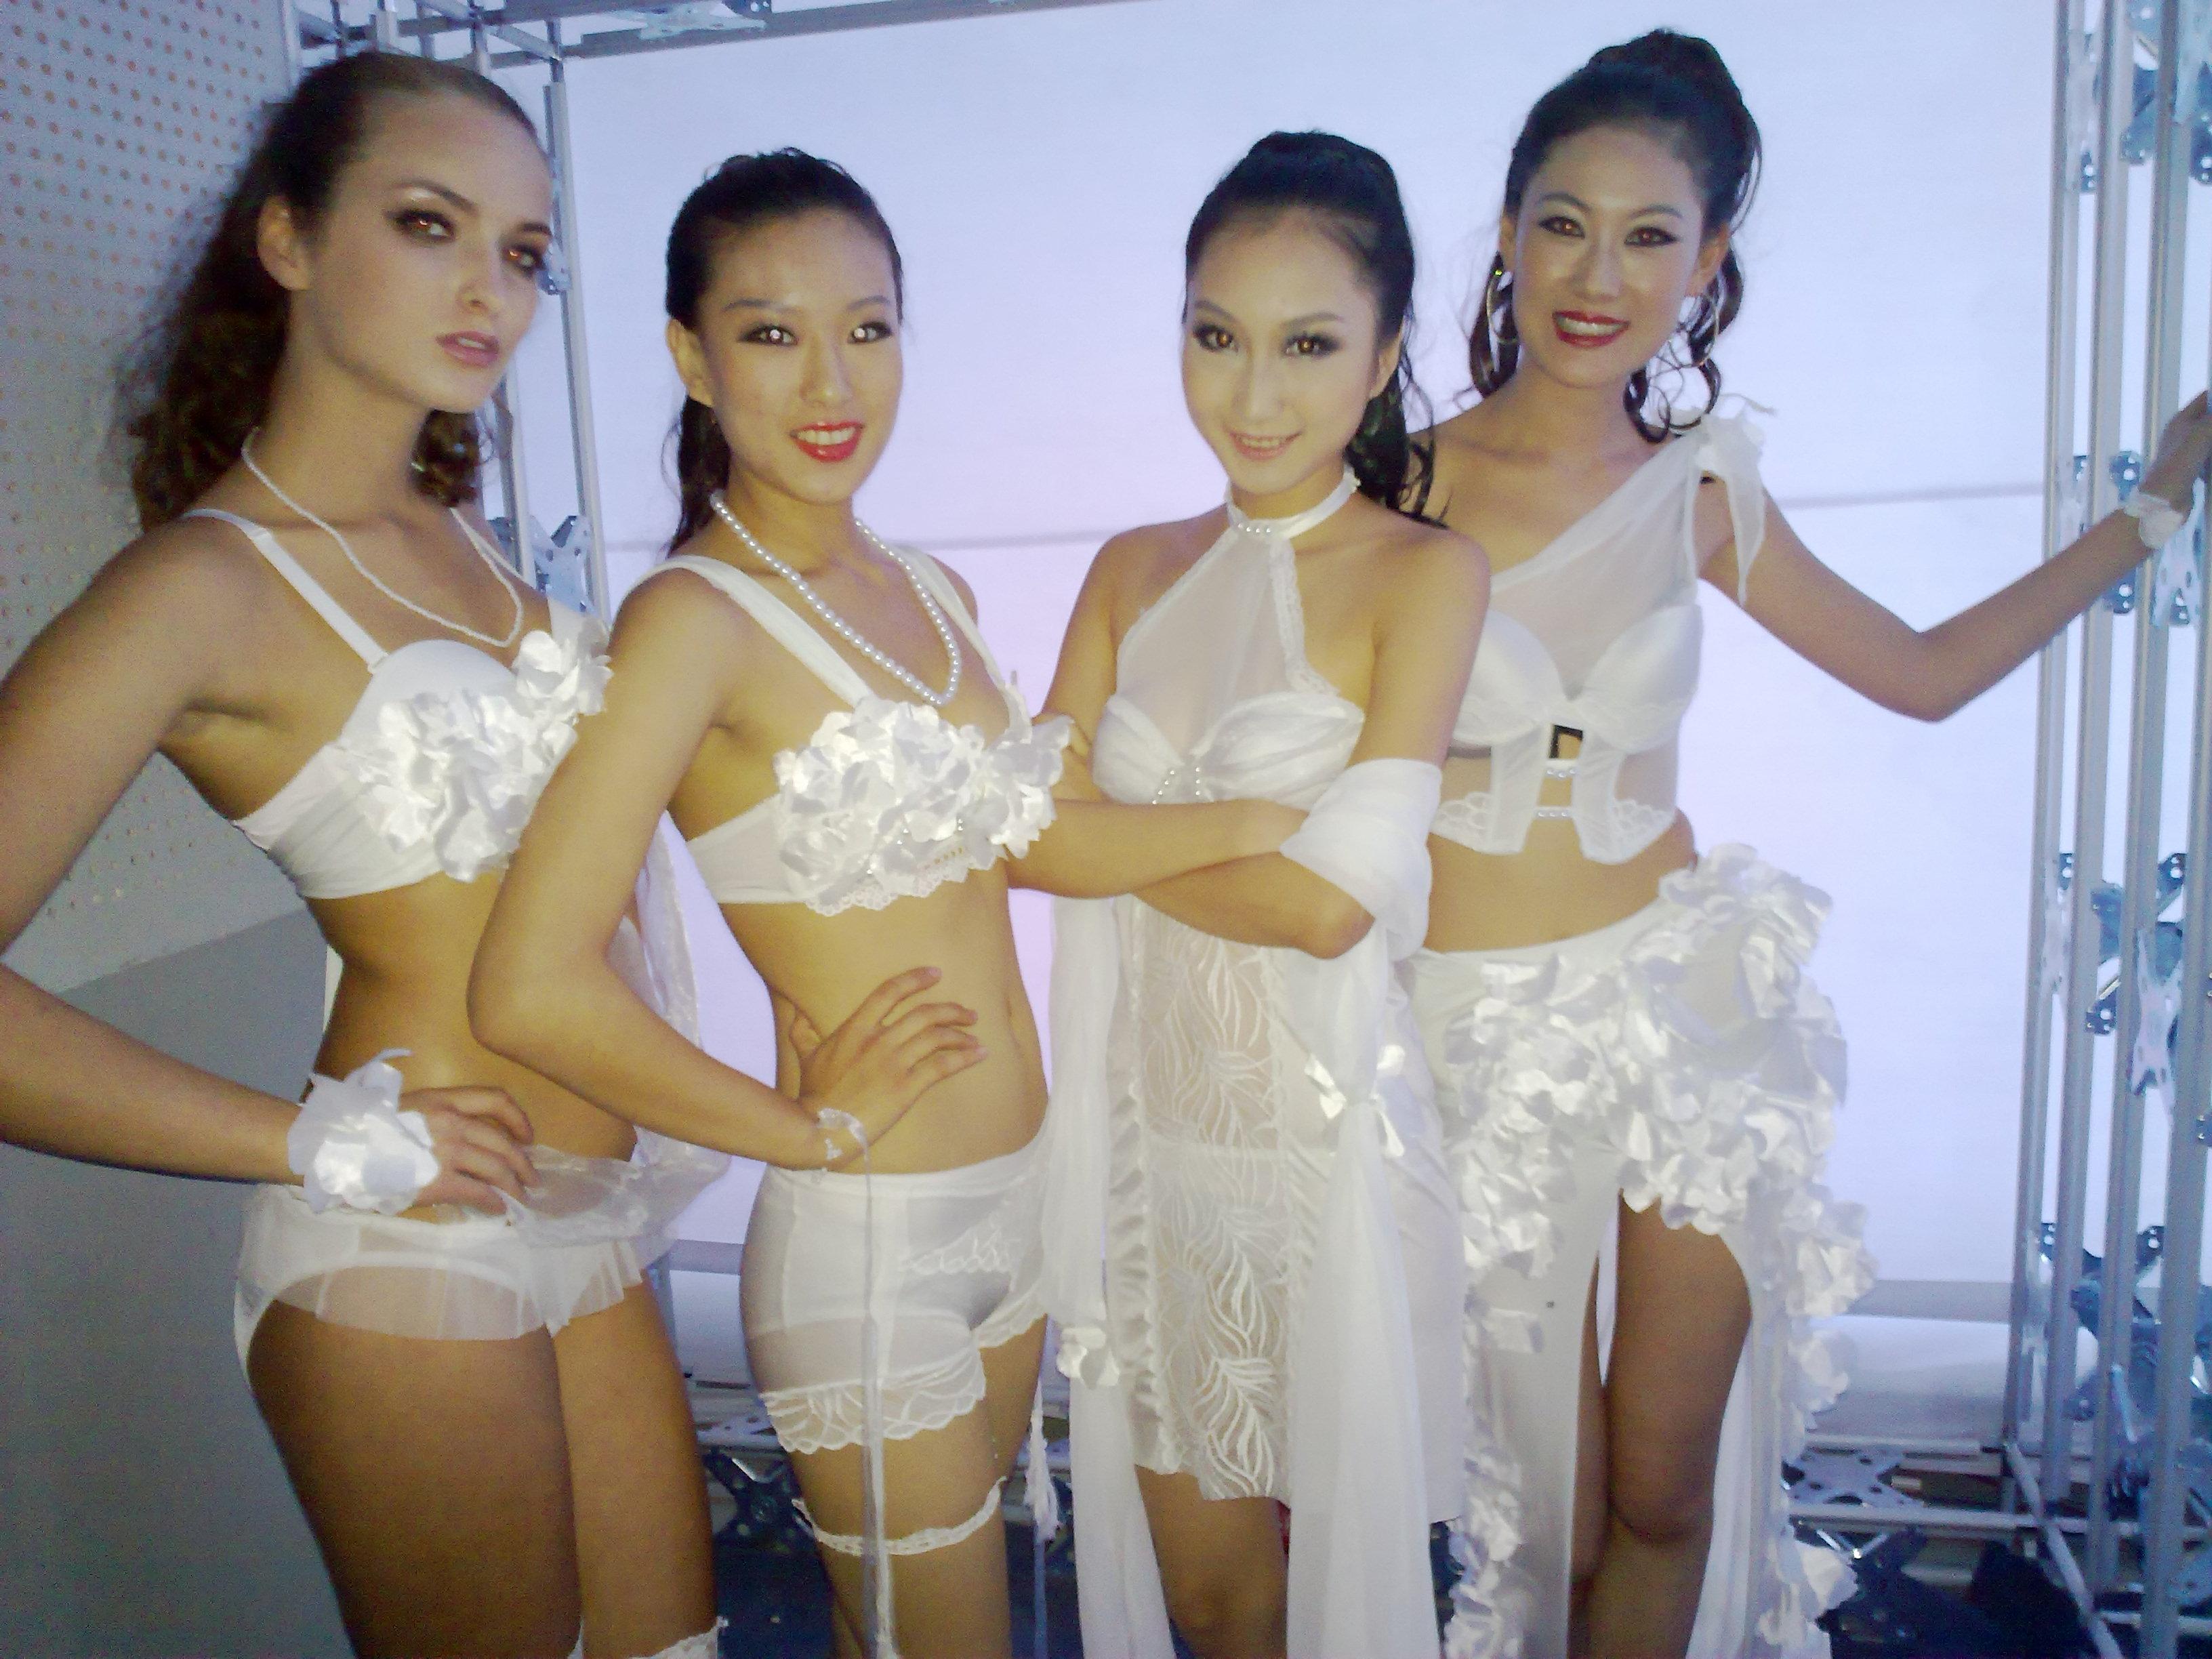 Dalian girls